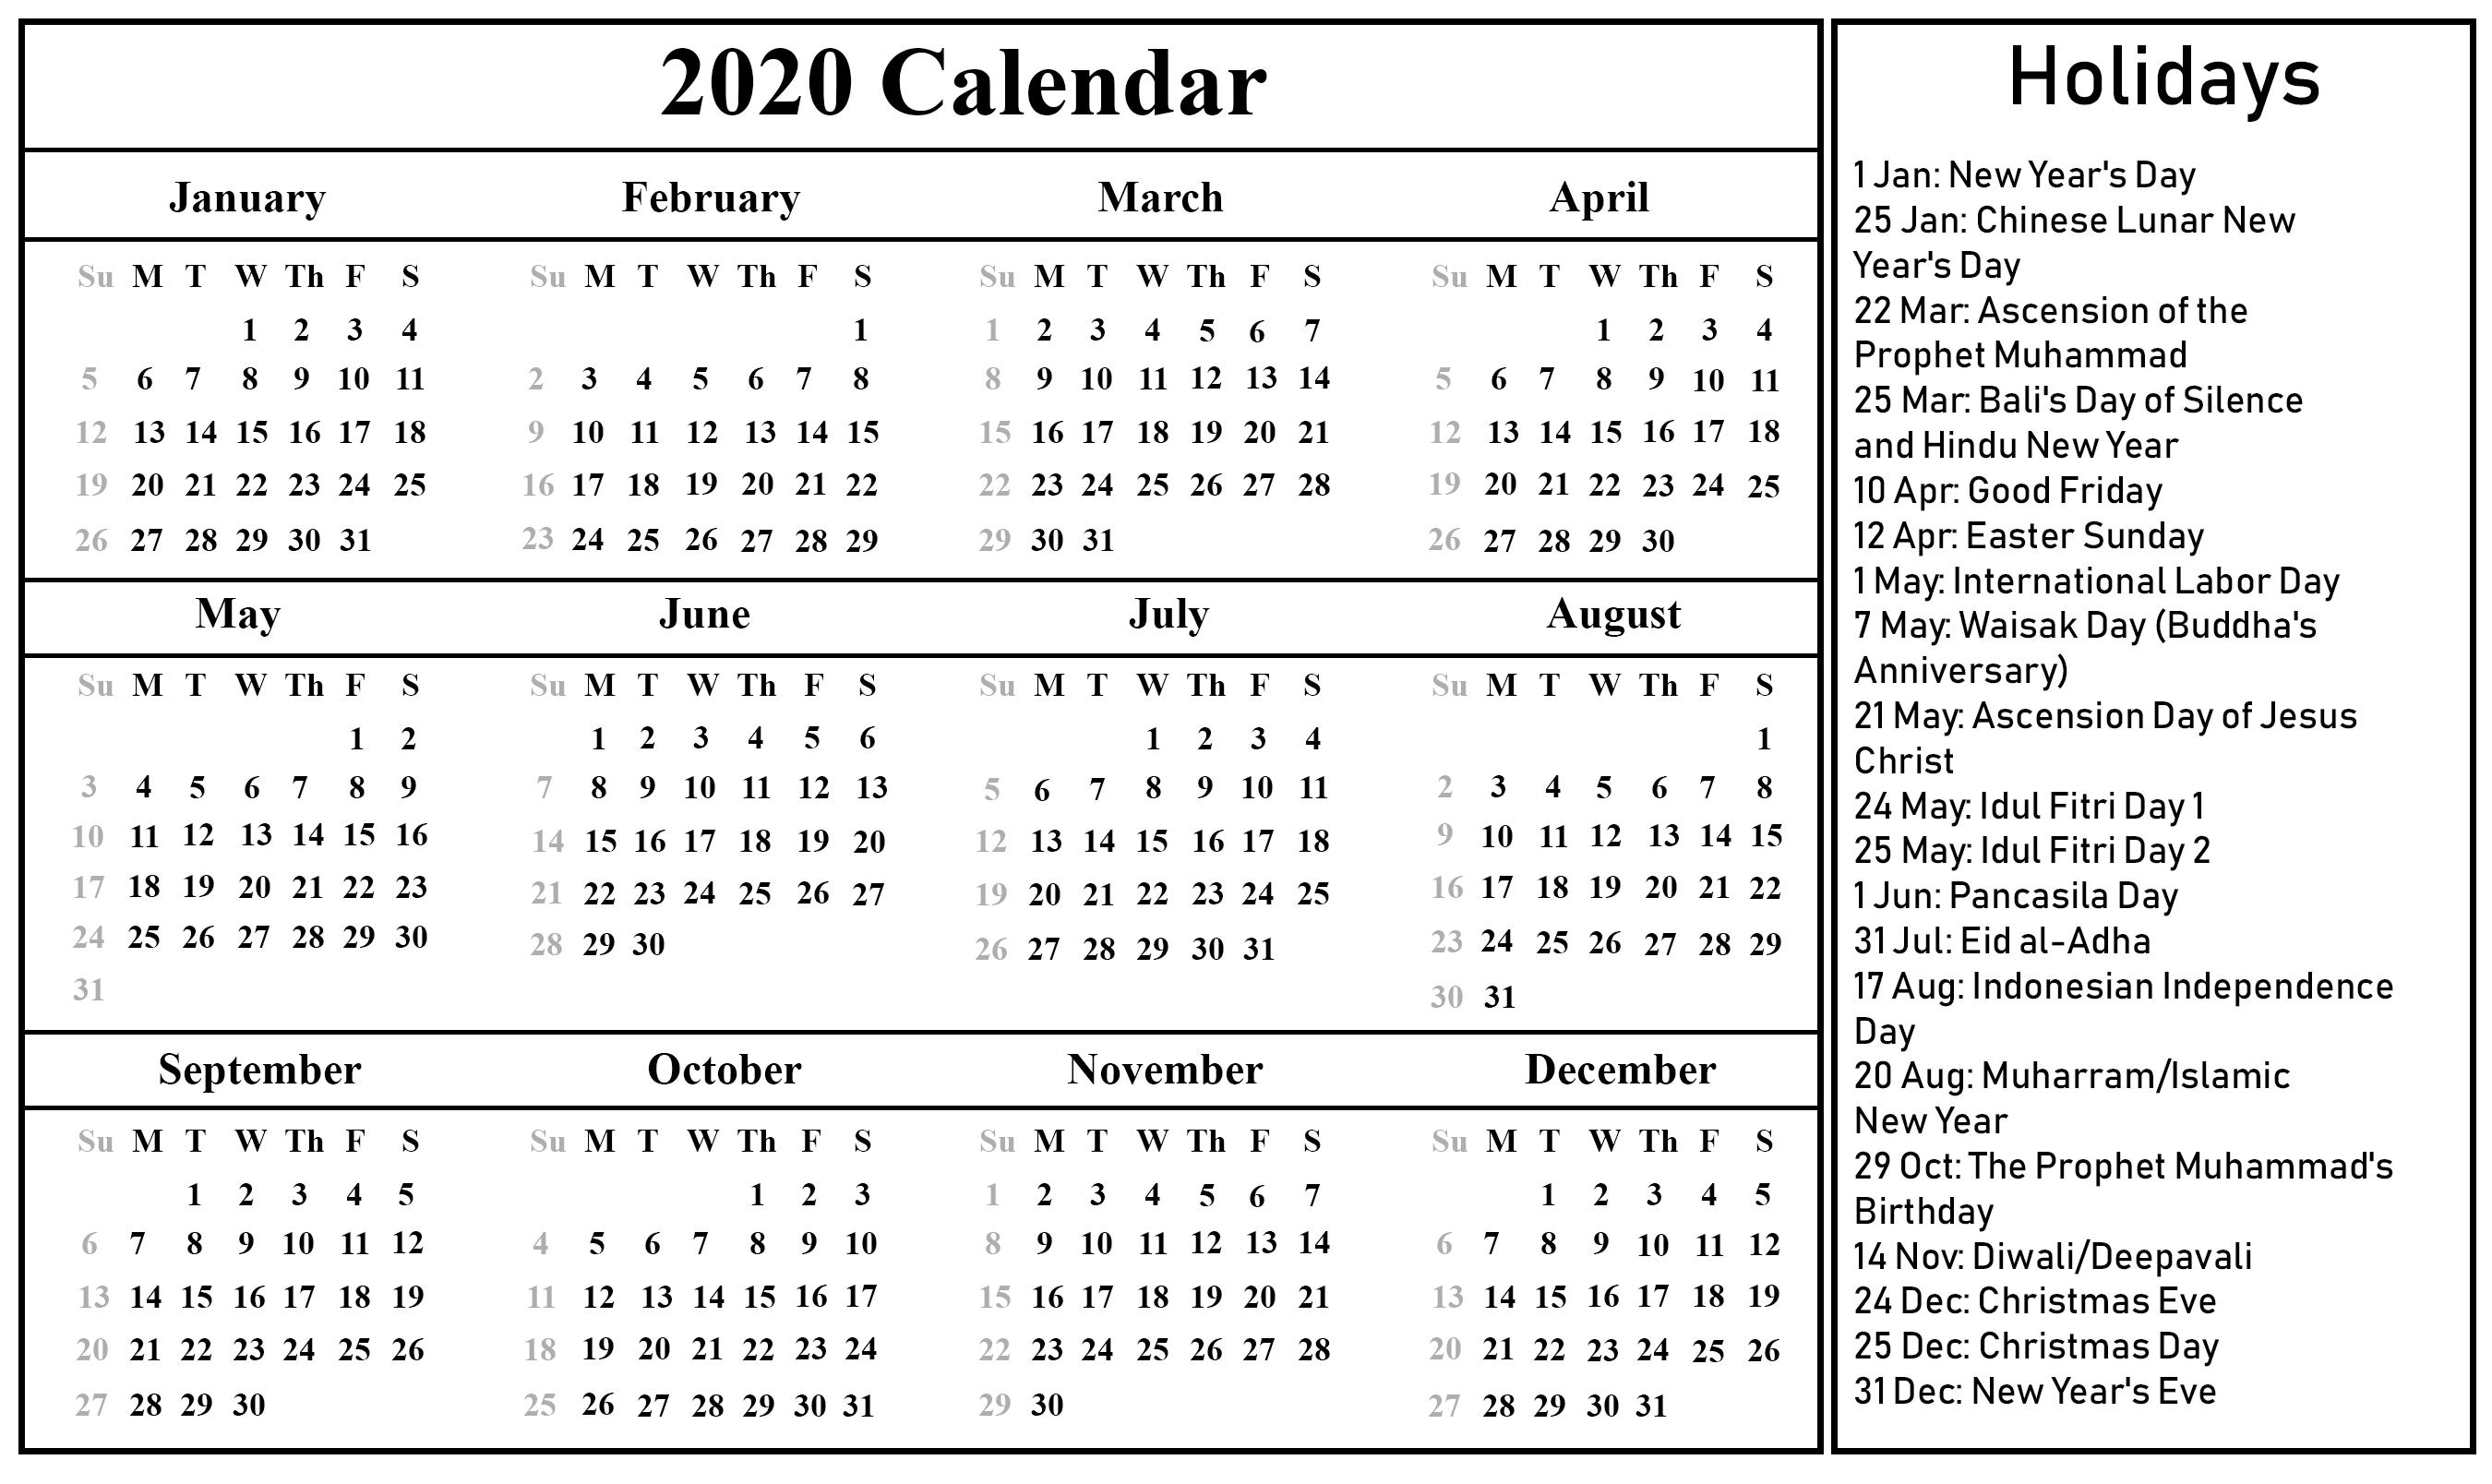 Free Download Blank Indonesia Calendar 2020 [Pdf, Excel-Calendar 2020 Holidays Hindi